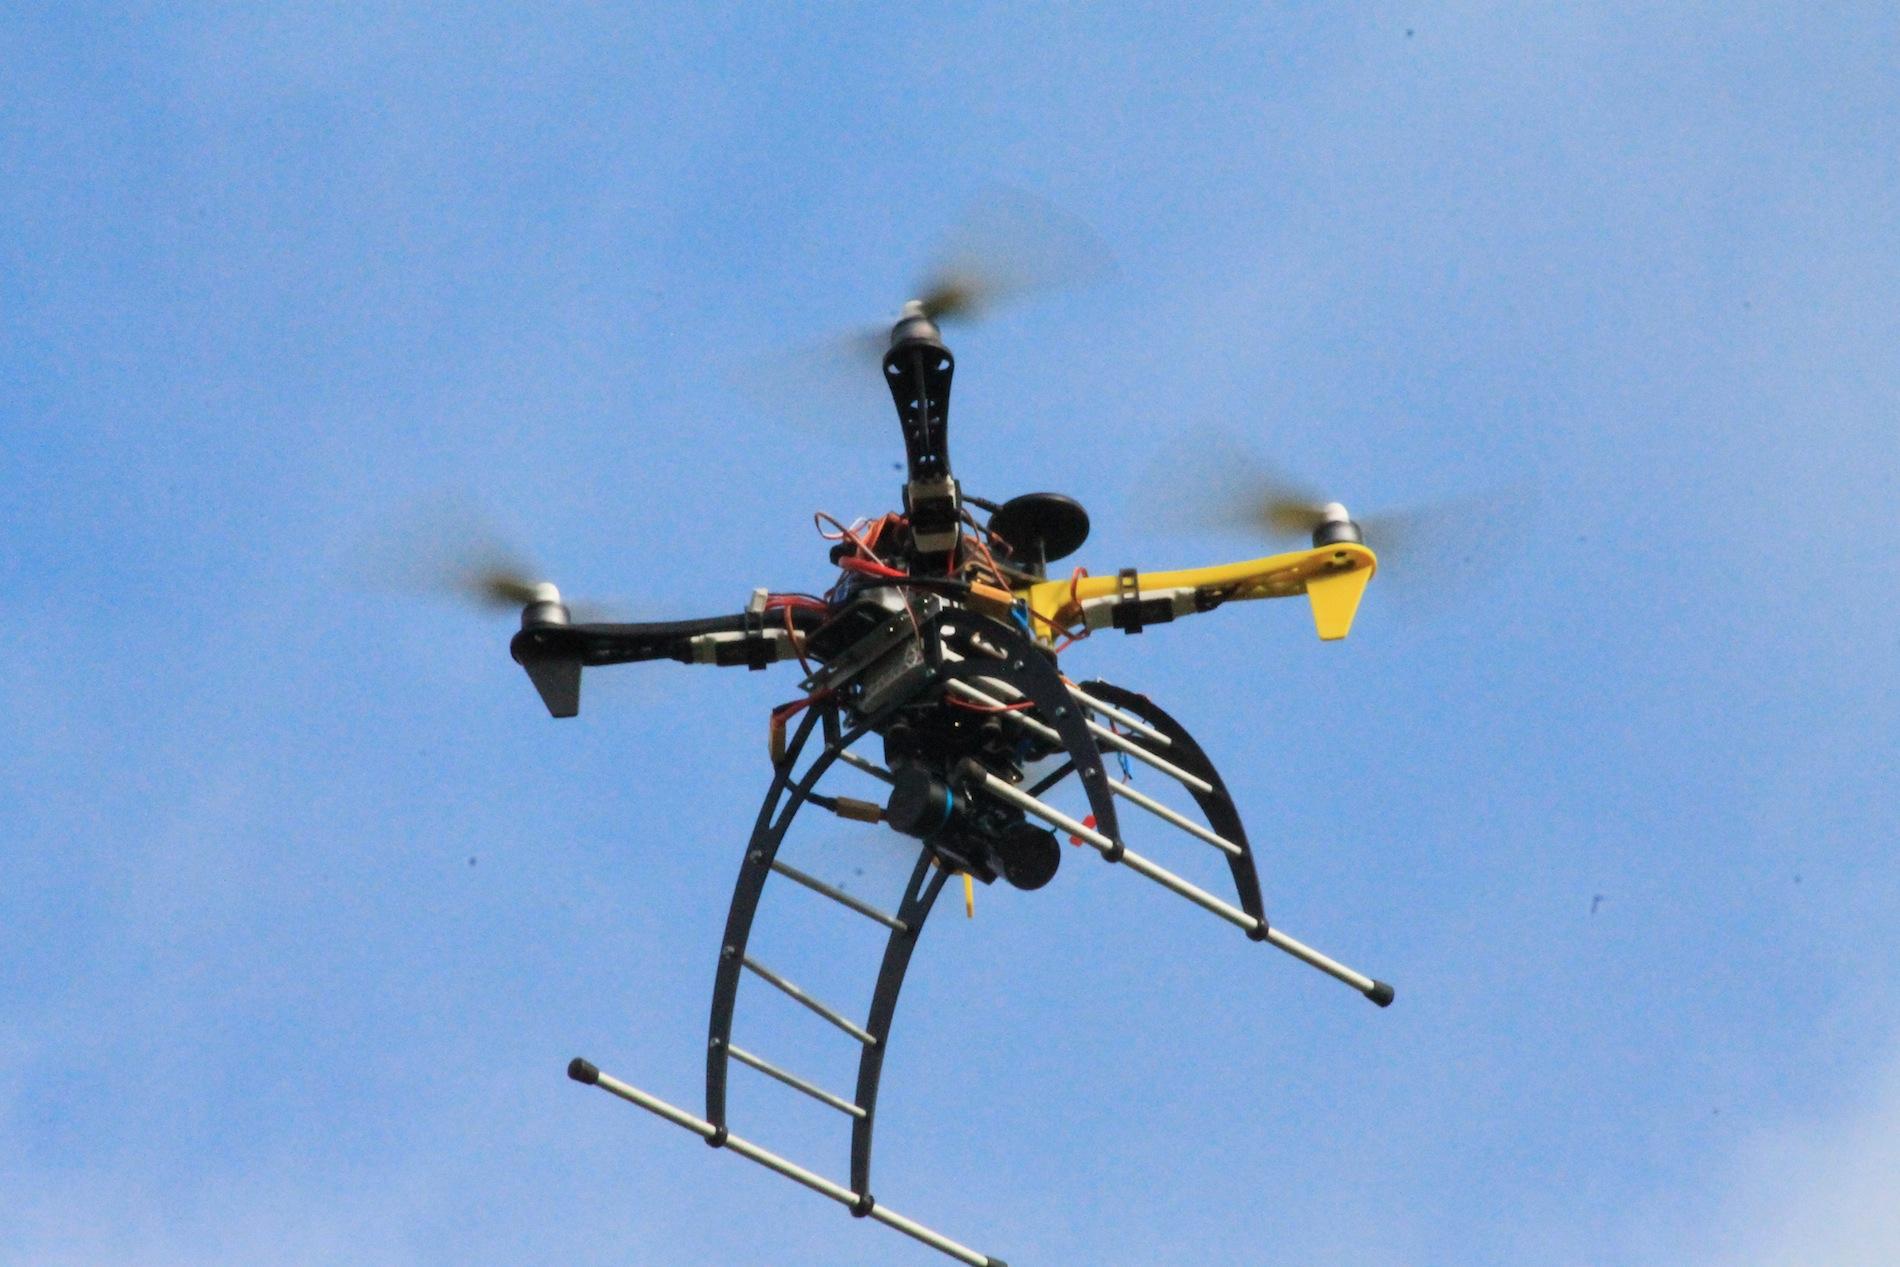 Erle Robotics' Erle-Copter educational open drone